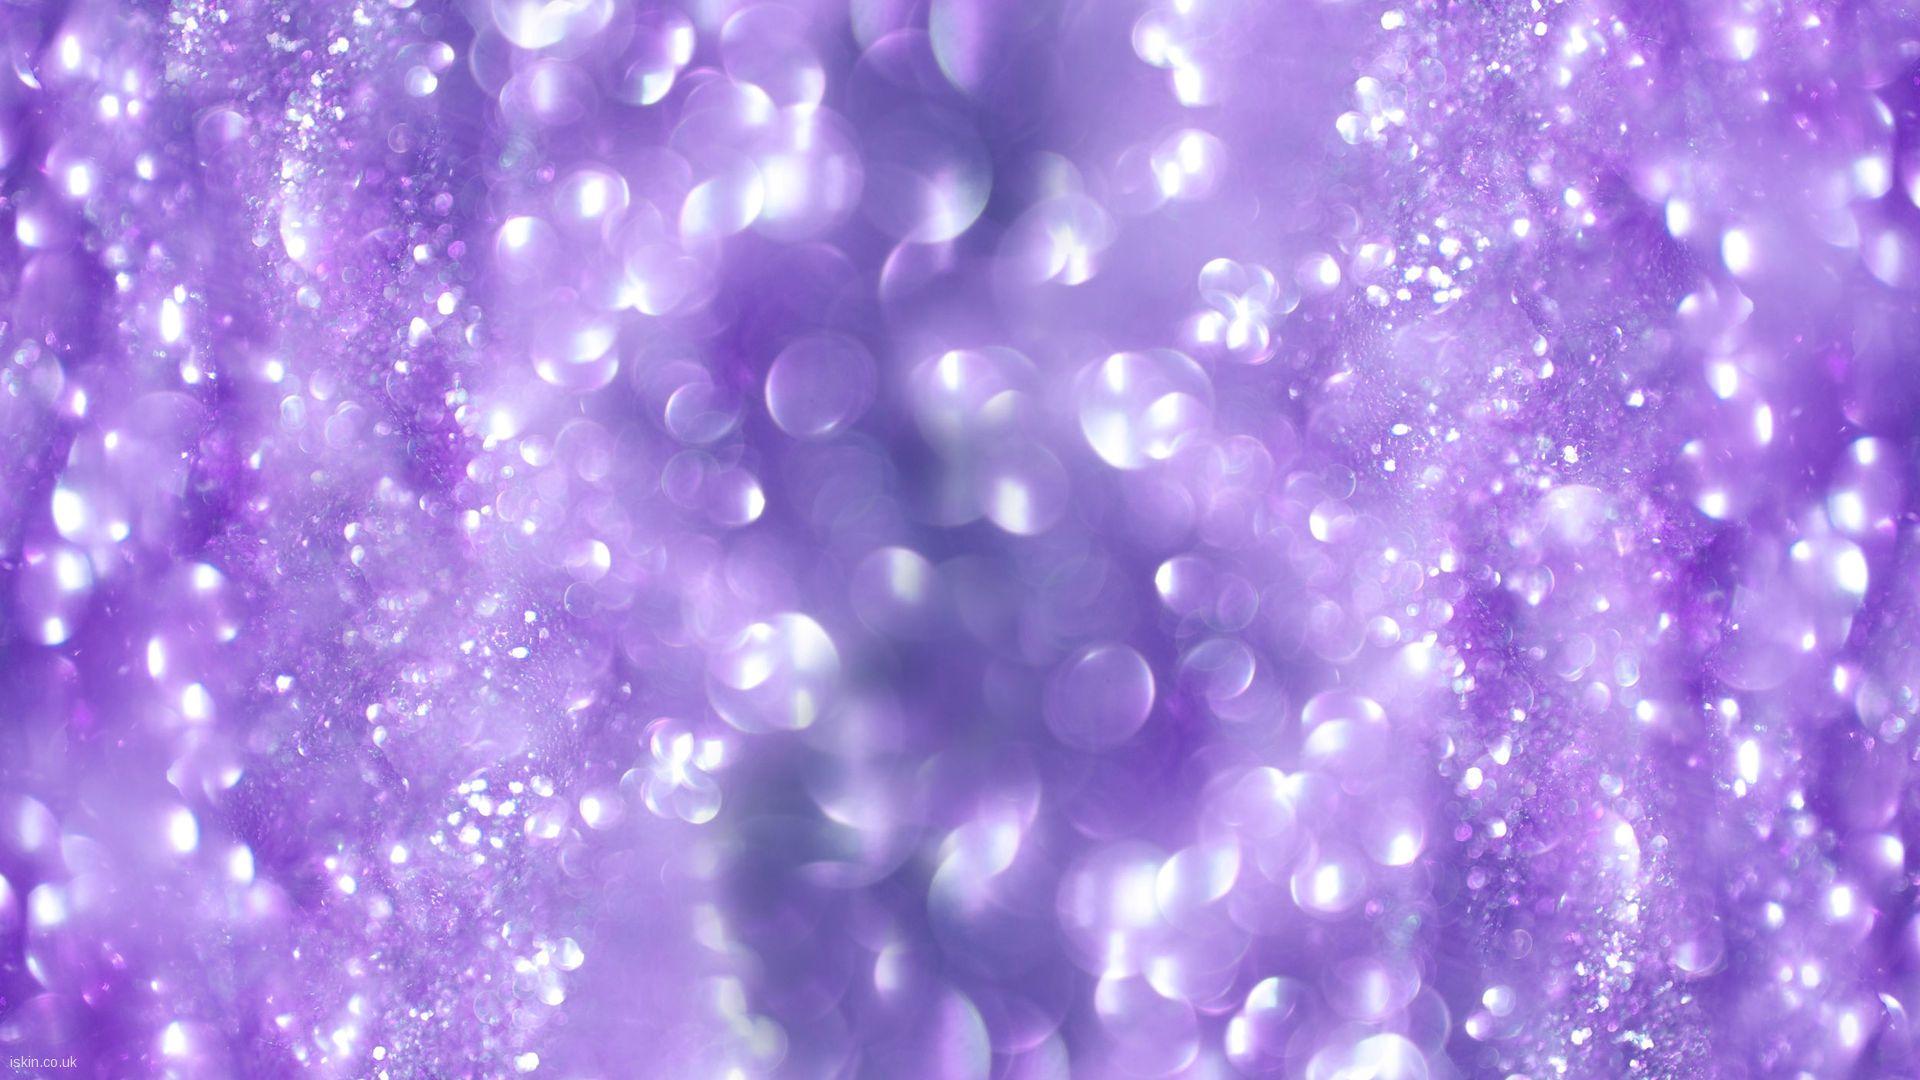 Sparkle Silver Texture Metallic Glitter Wallpaper